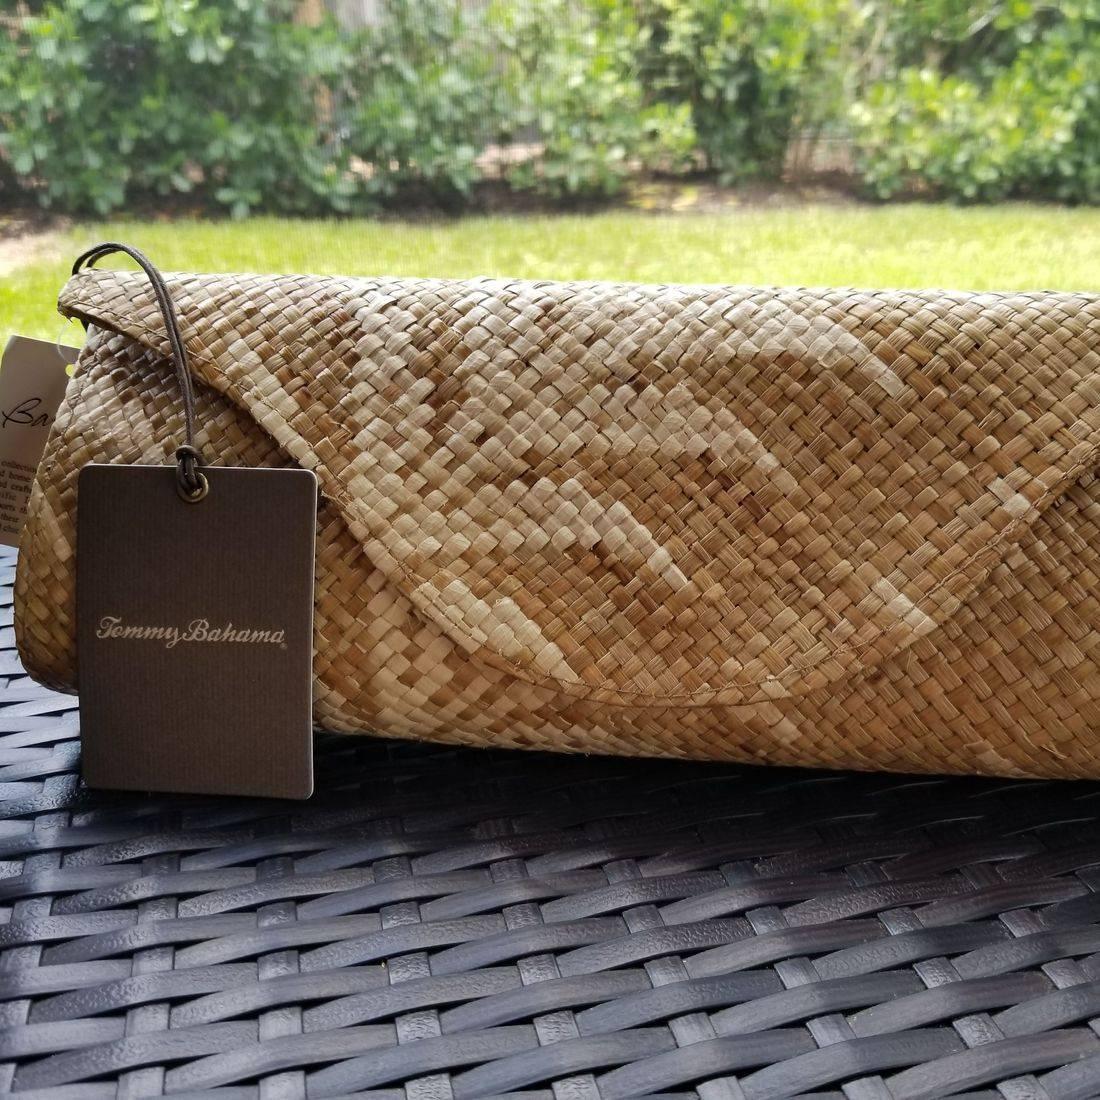 Tommy Bahama hand woven purse Banago